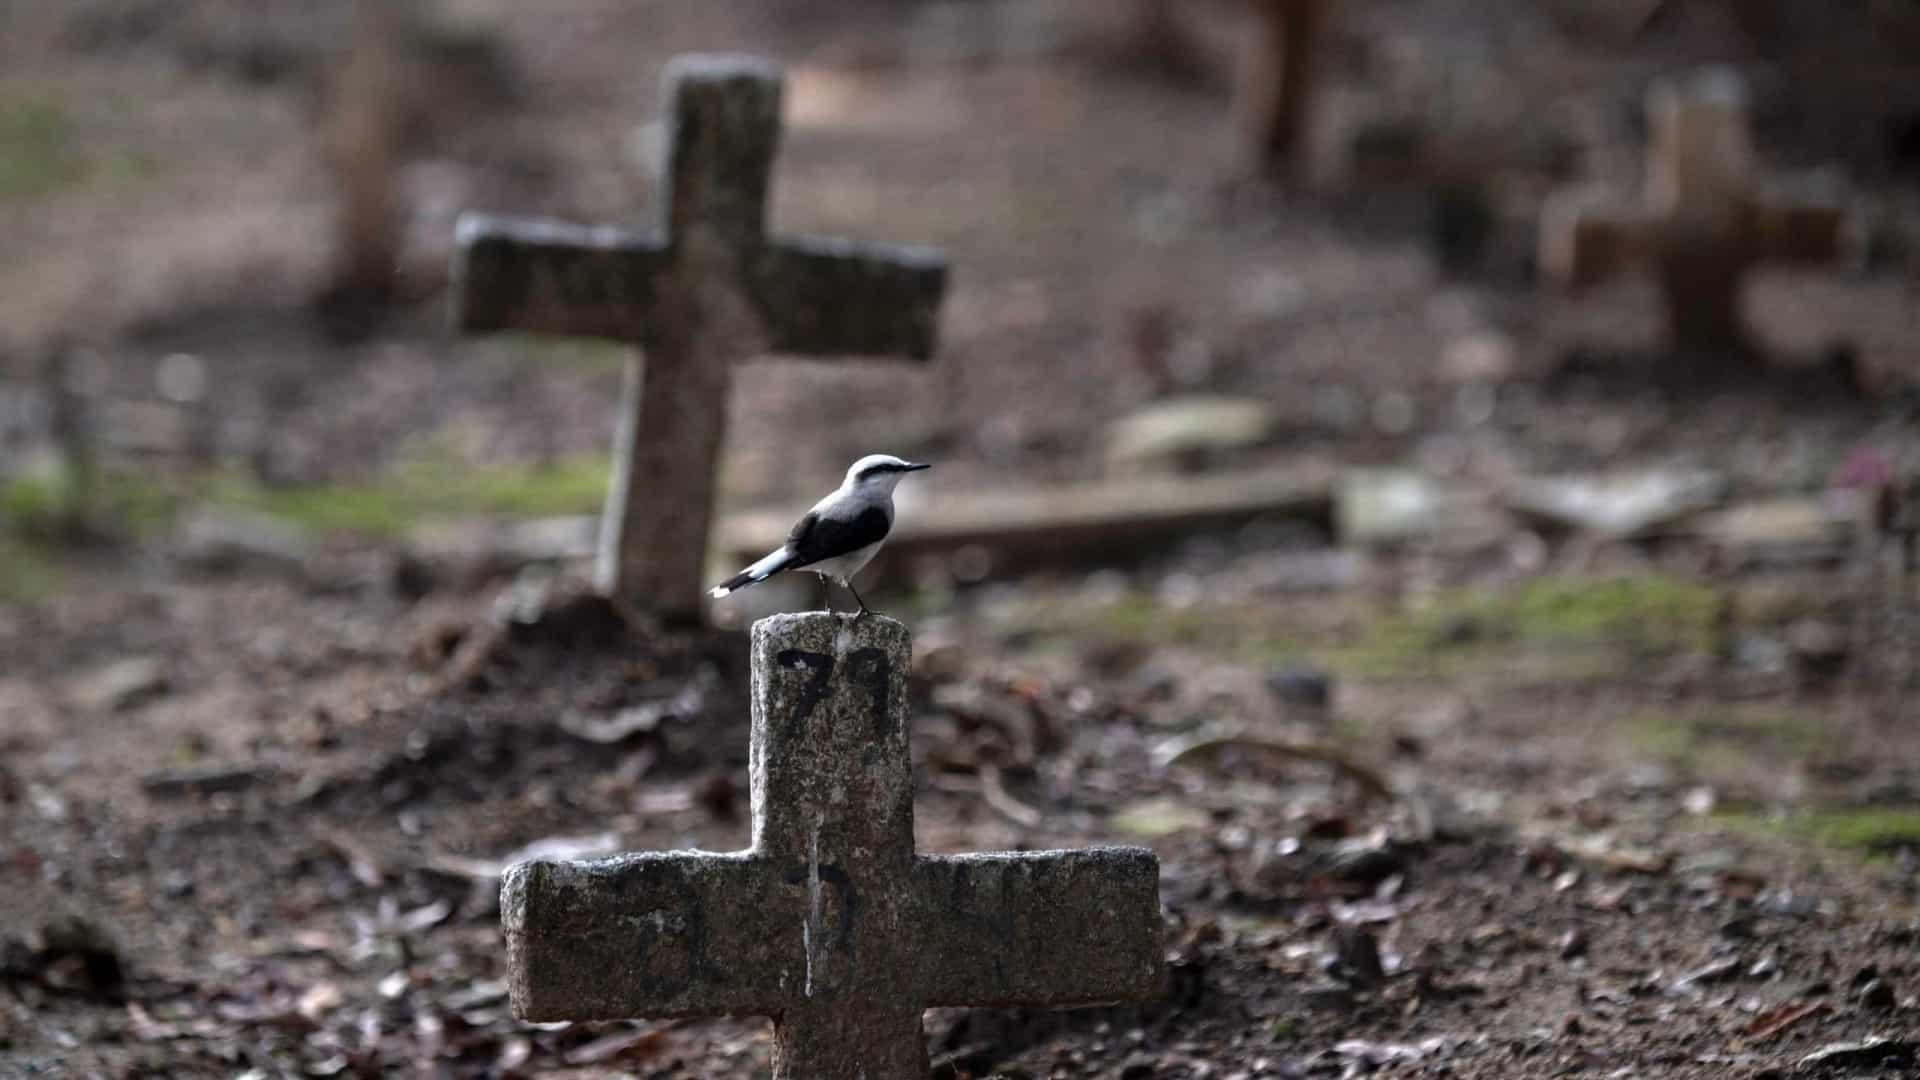 Número de mortes por covid-19 no Brasil chega a 449.068